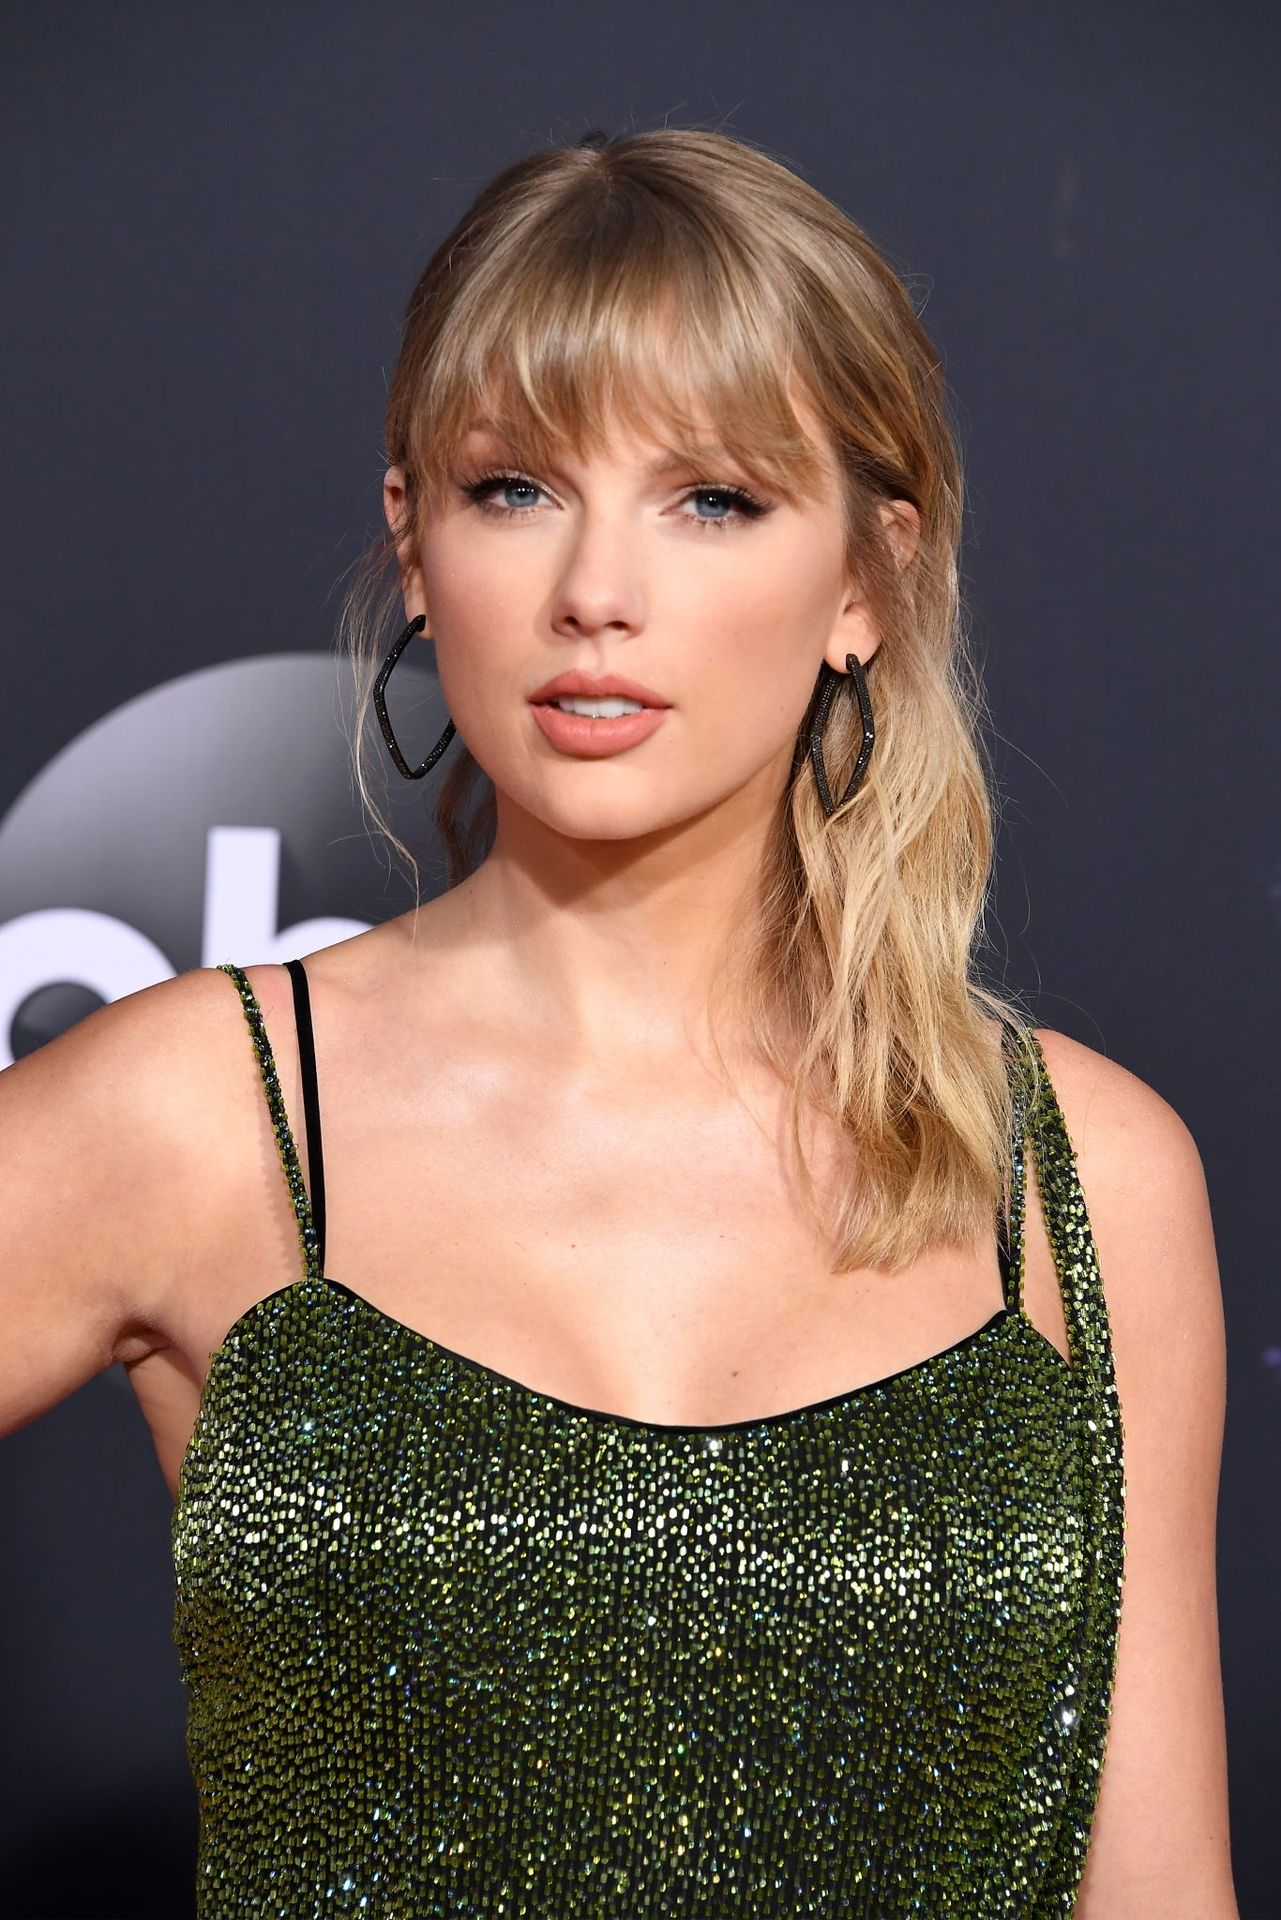 Taylor Swift Sexy 0068